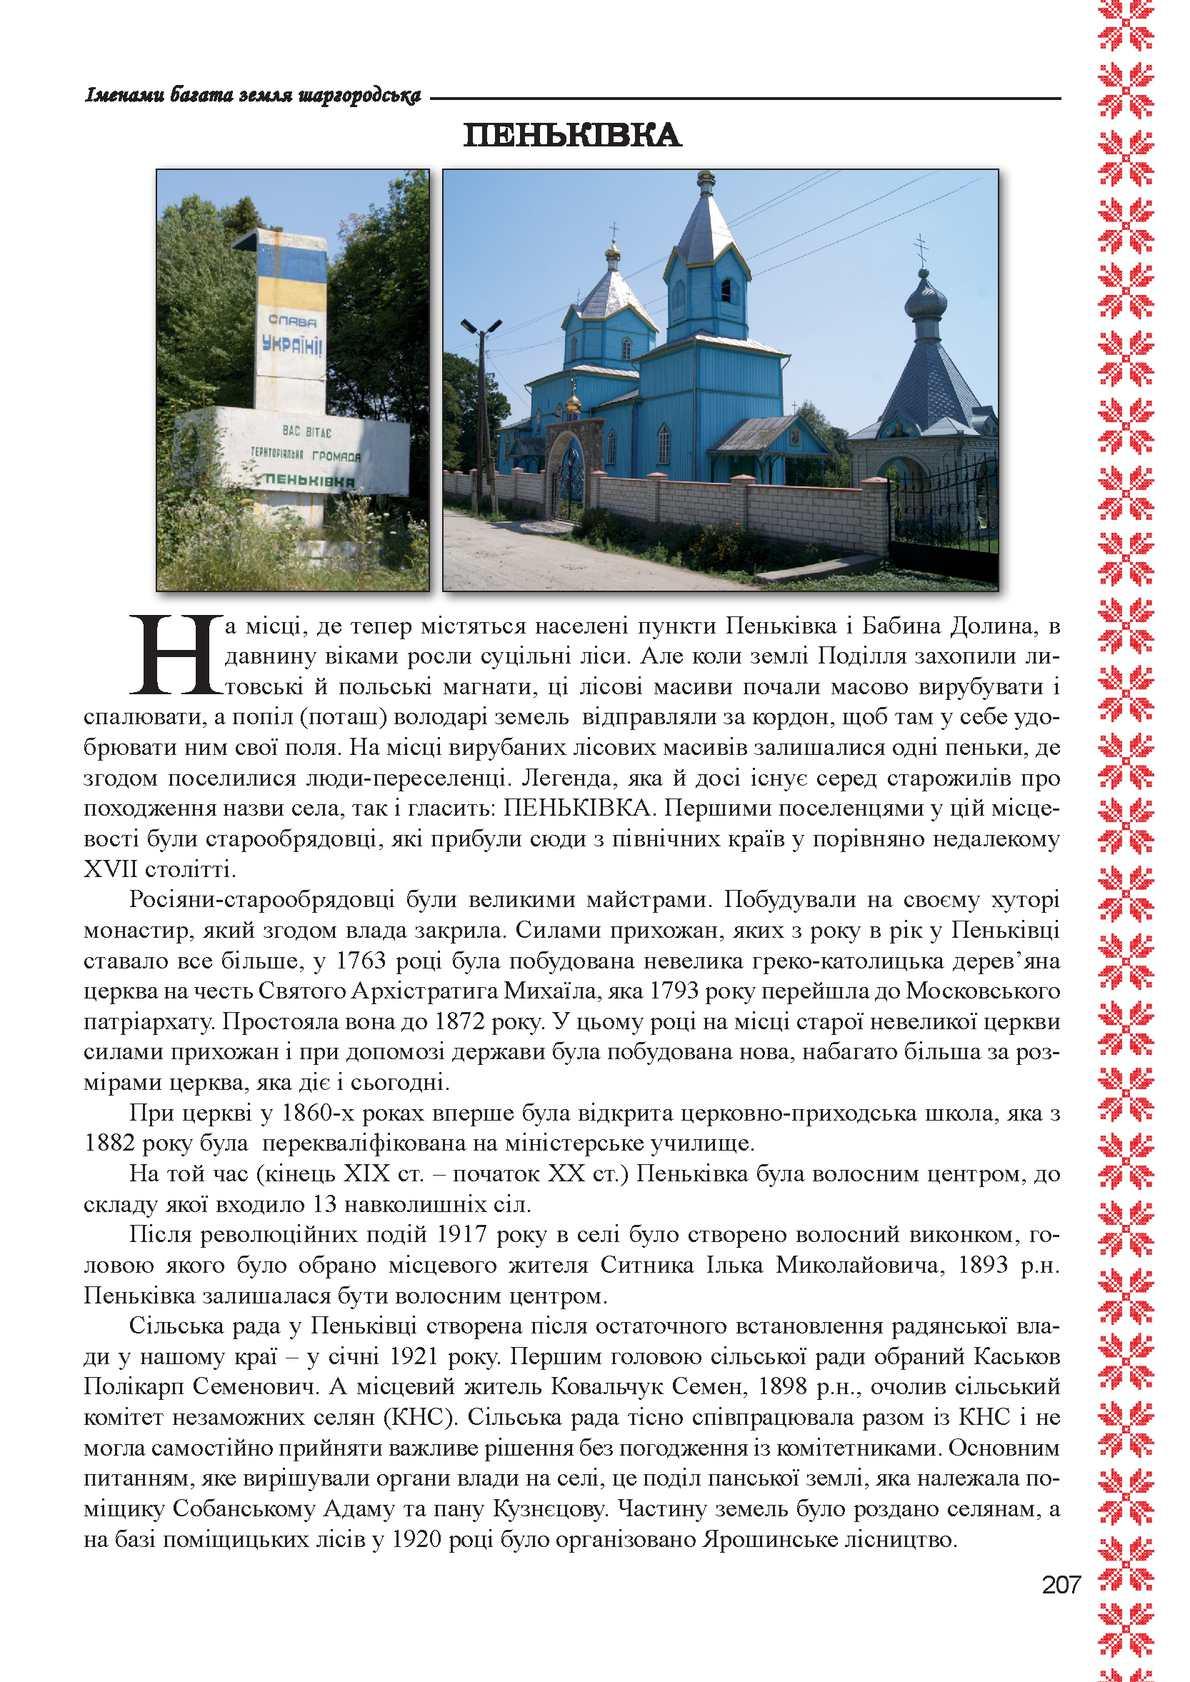 Calaméo - Нагребецький А. Іменами багата земля Шаргородська 2 999260ed97990